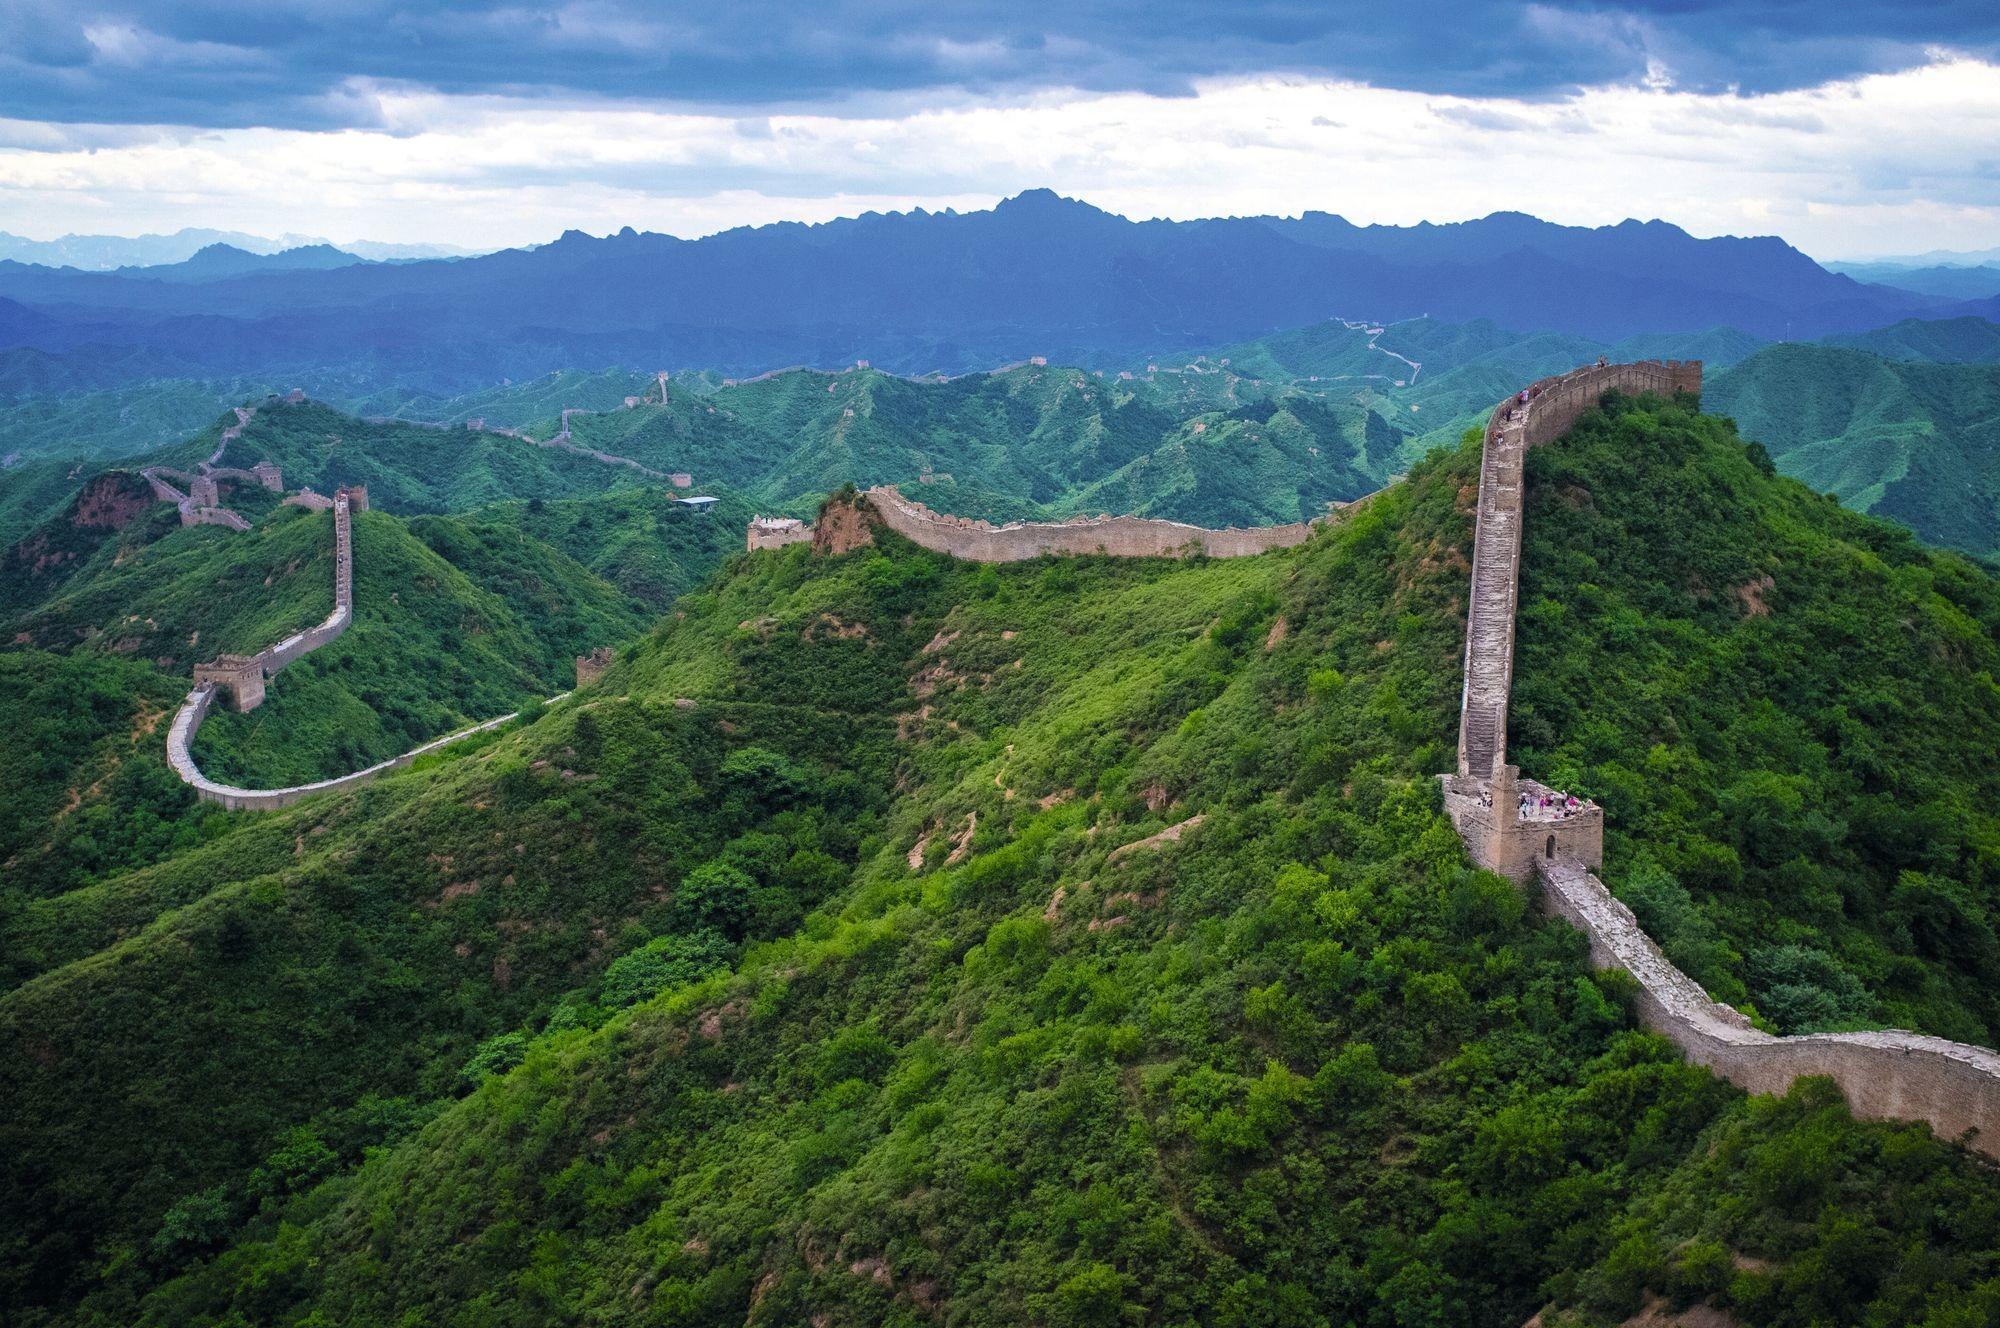 La naissance de l'Empire chinois (221-206 av. J-C.)